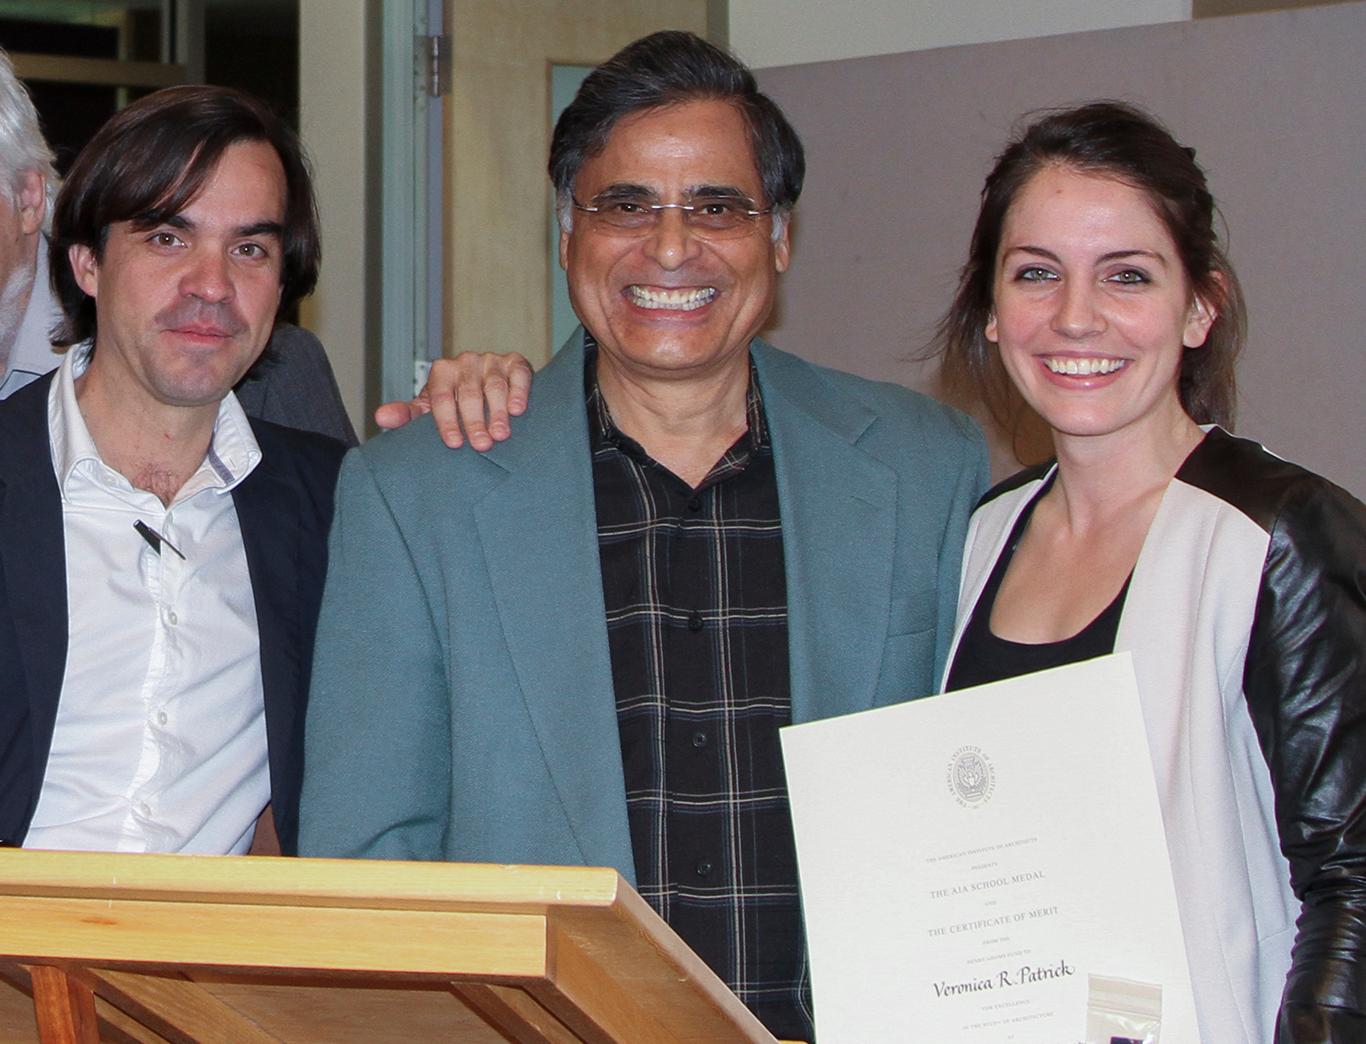 Juan Ruescas, Jawaid Haider, and Veronica Patrick